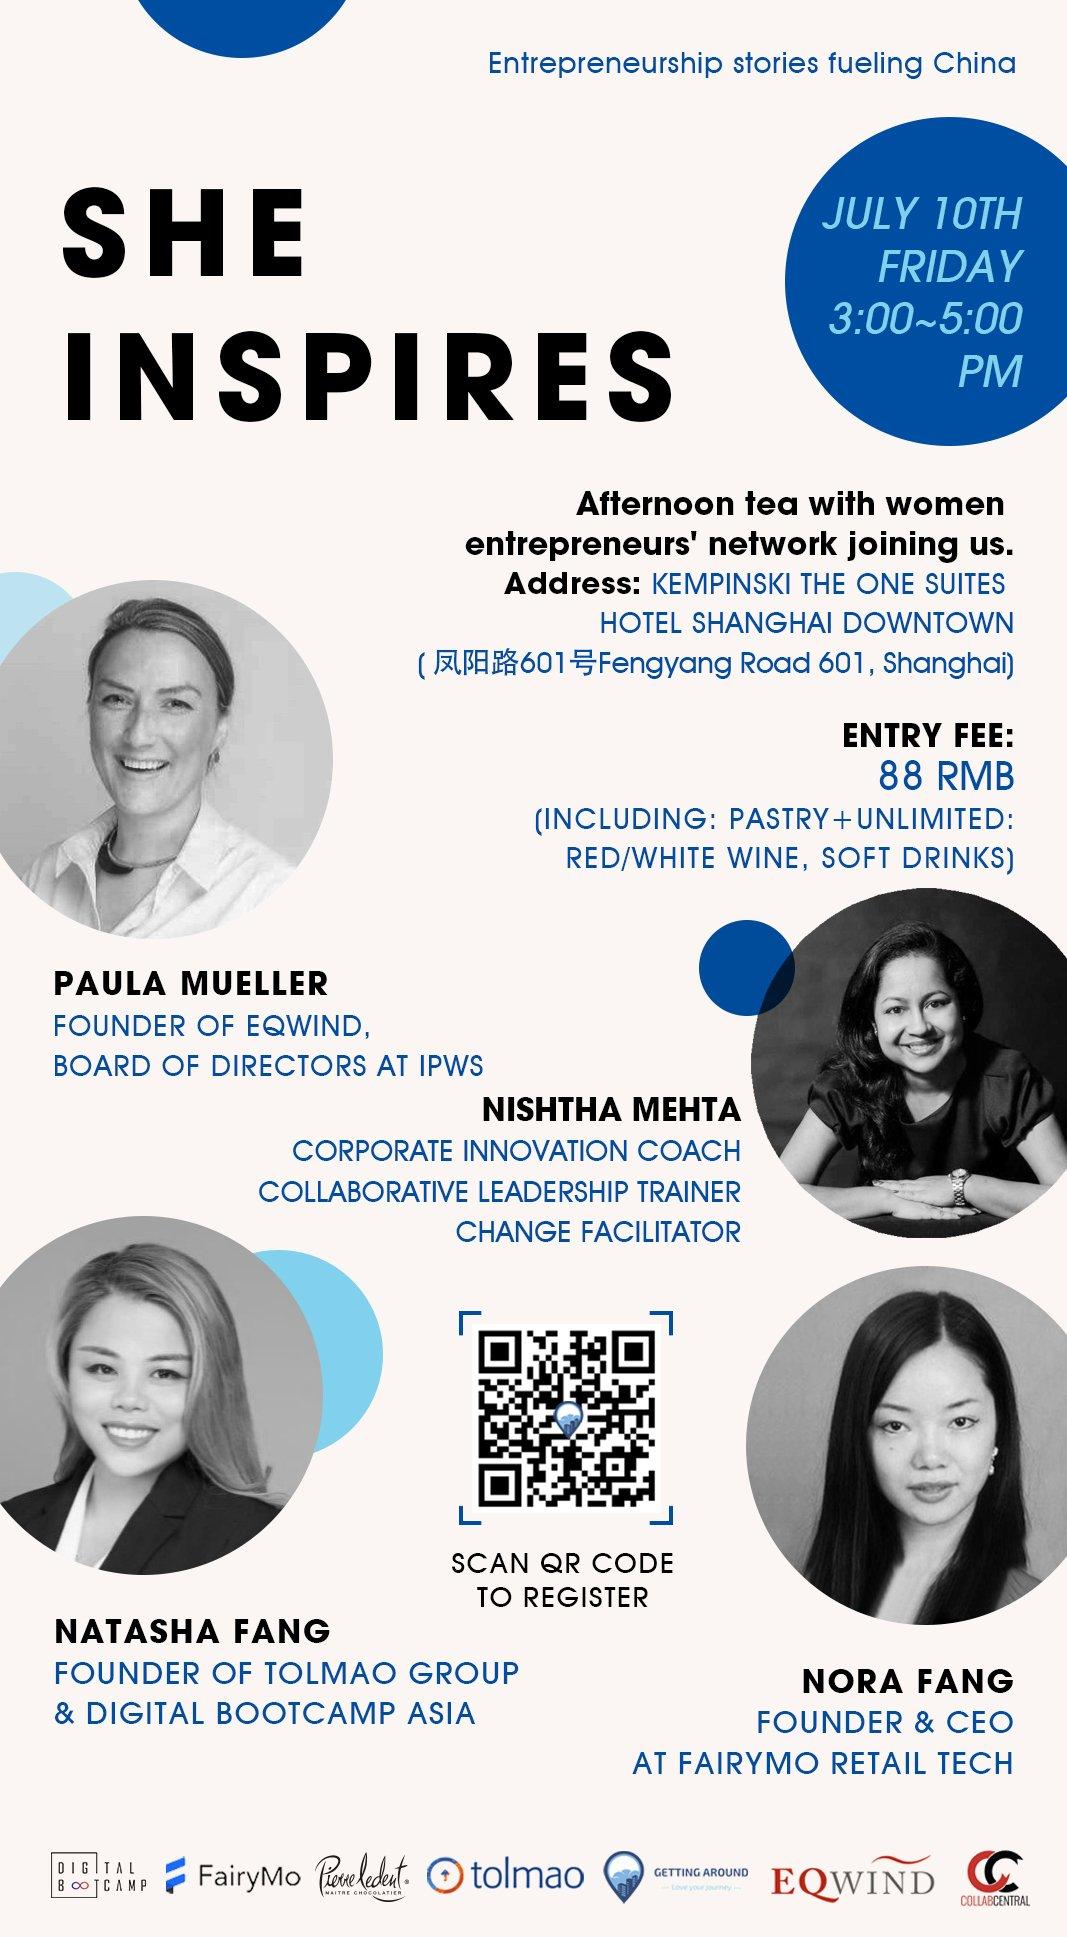 July 10th Offline Event: SHE INSPIRES – Entrepreneurship stories fueling China